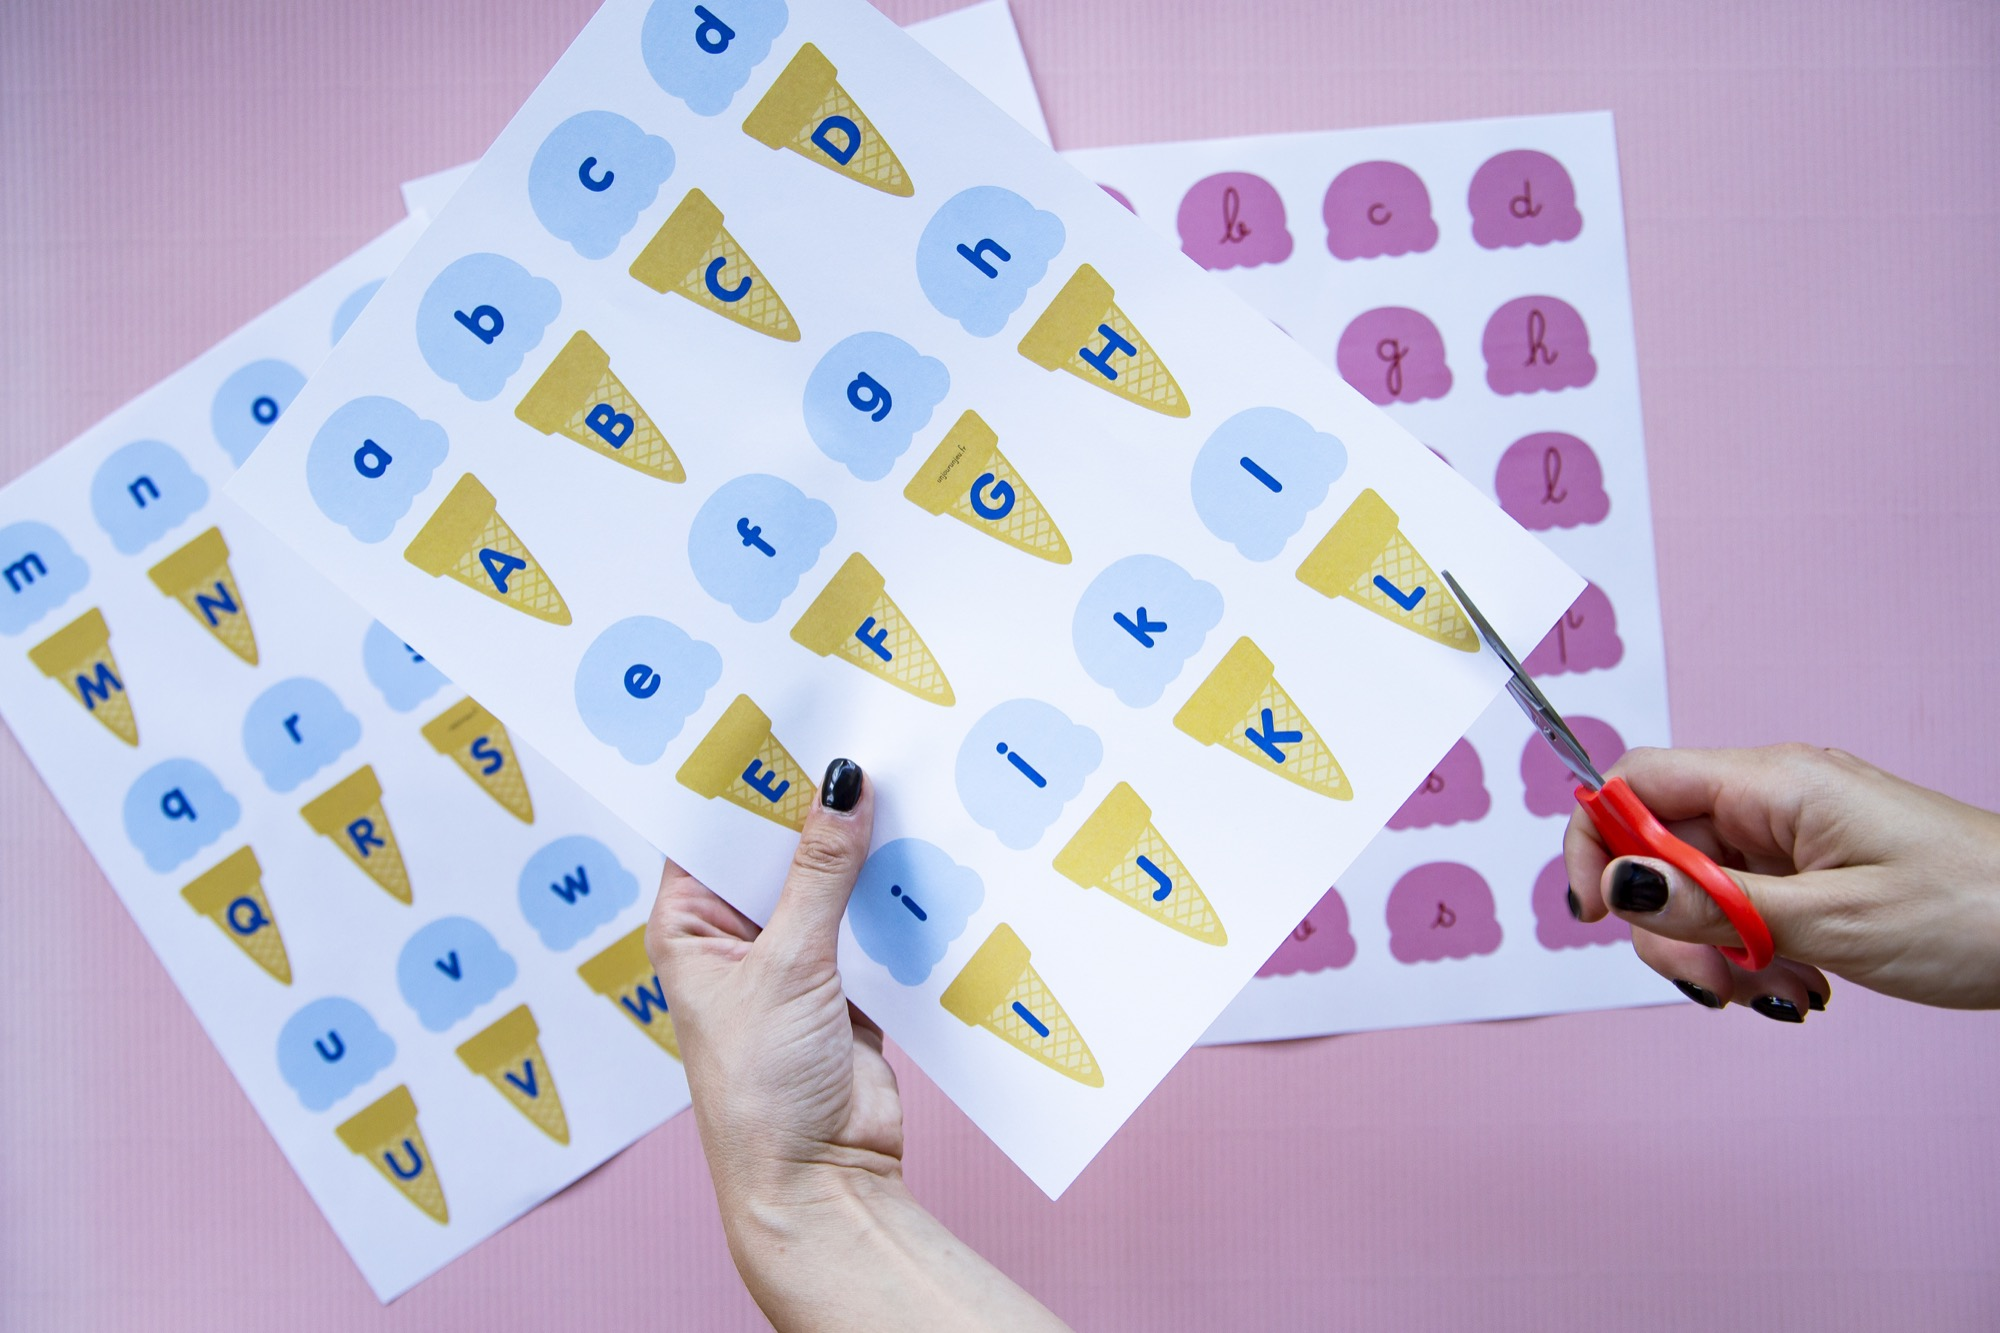 Correspondance alphabet glaces - étape 2